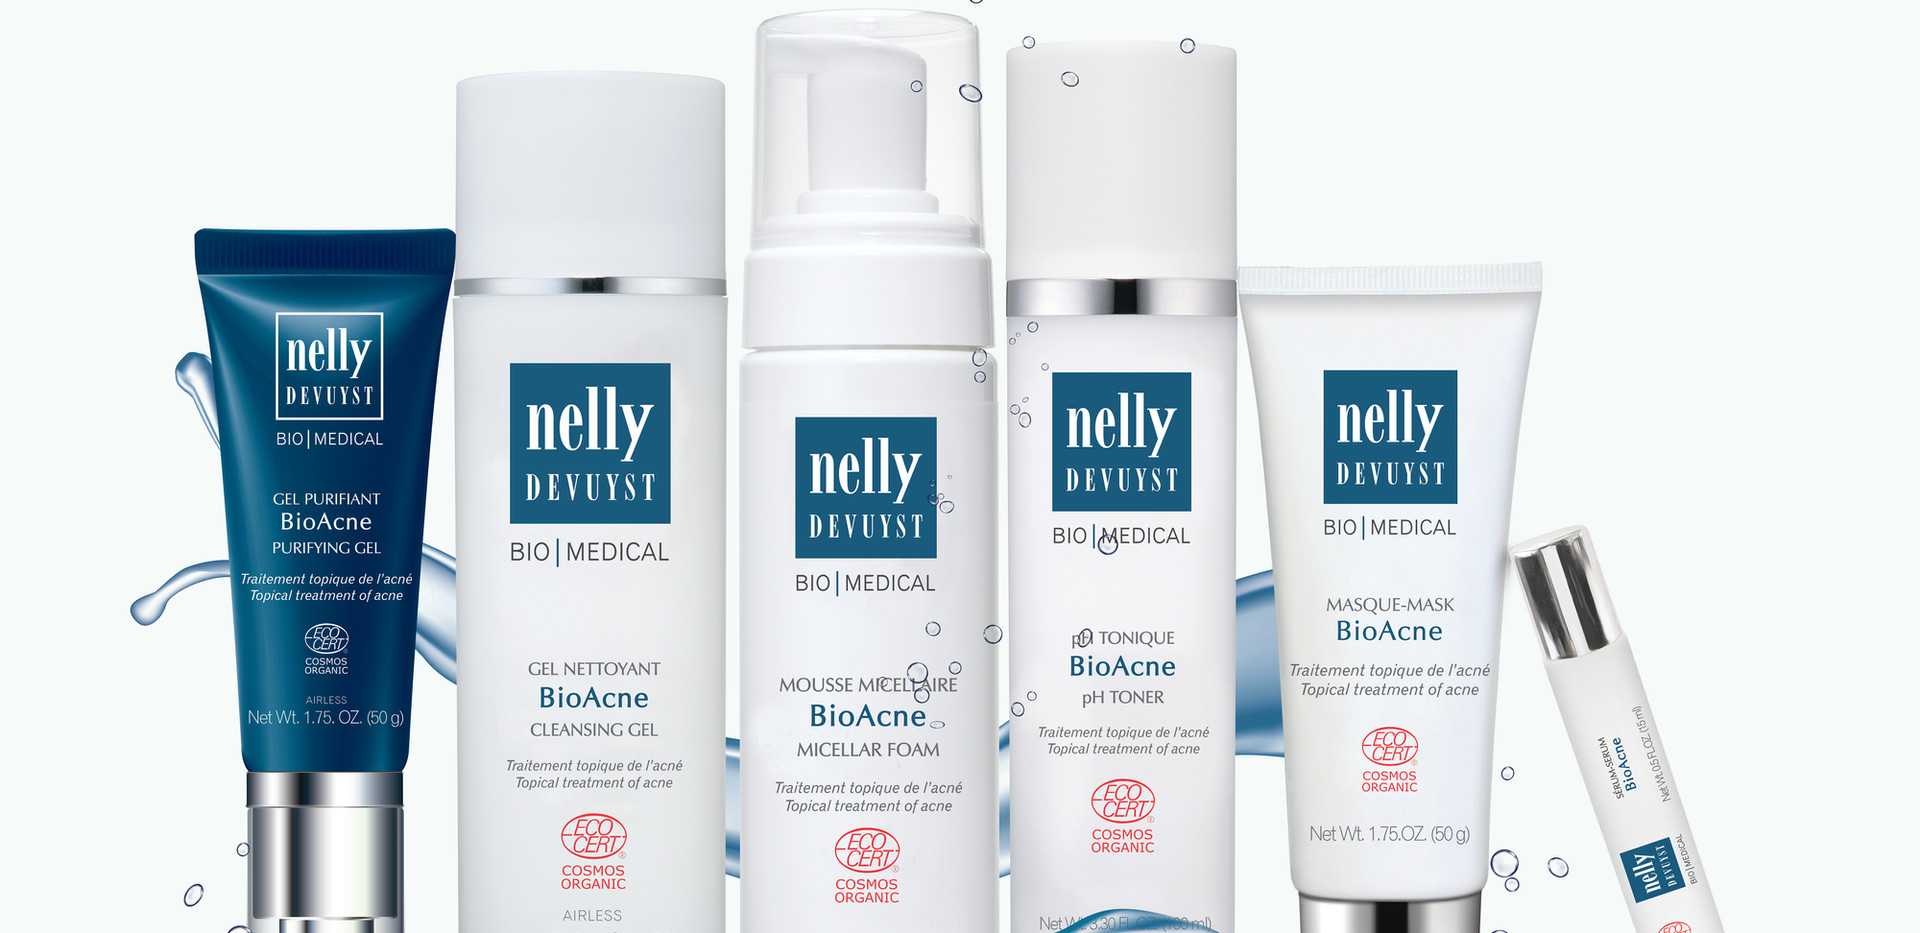 NellyDV_NEW-BioAcne.jpg